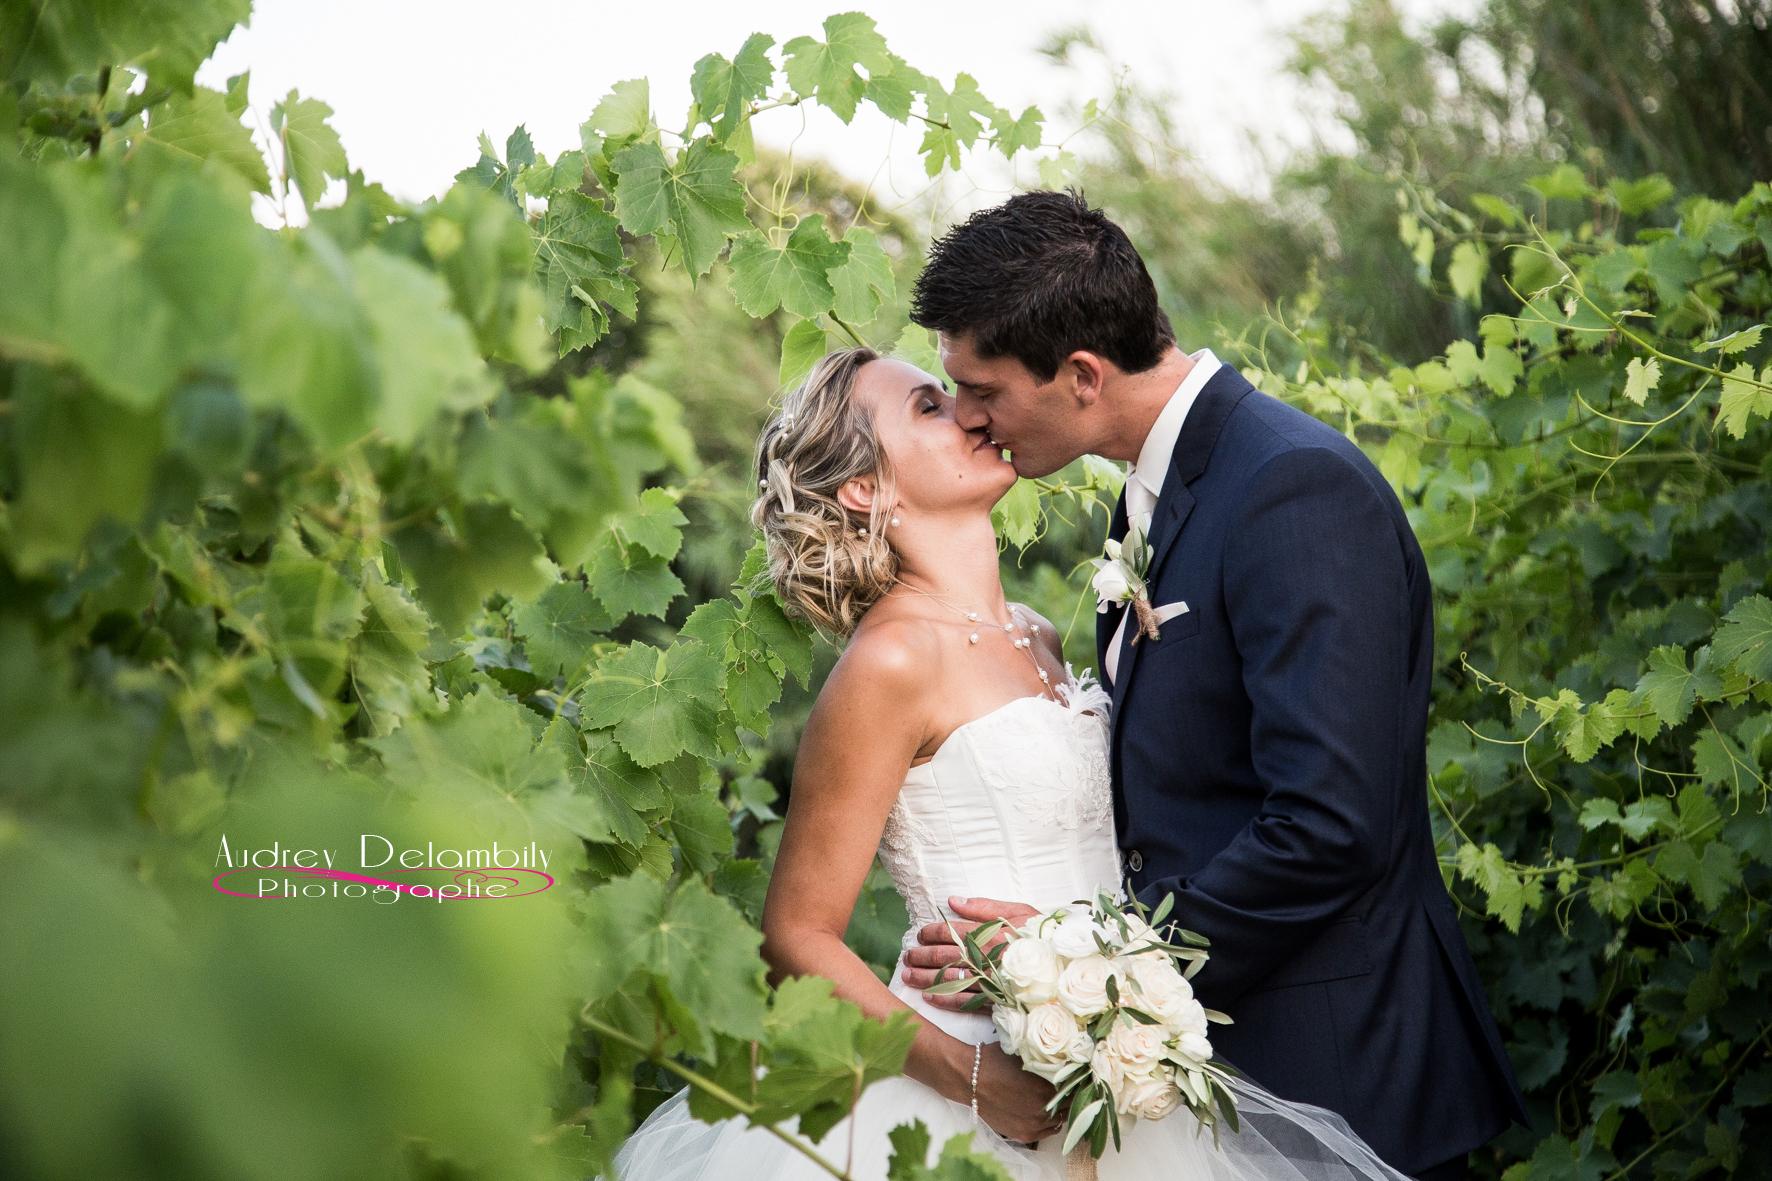 photographe mariage pavillon sully aumerade pierrefeu audrey delambily - Chateau De Sully Mariage